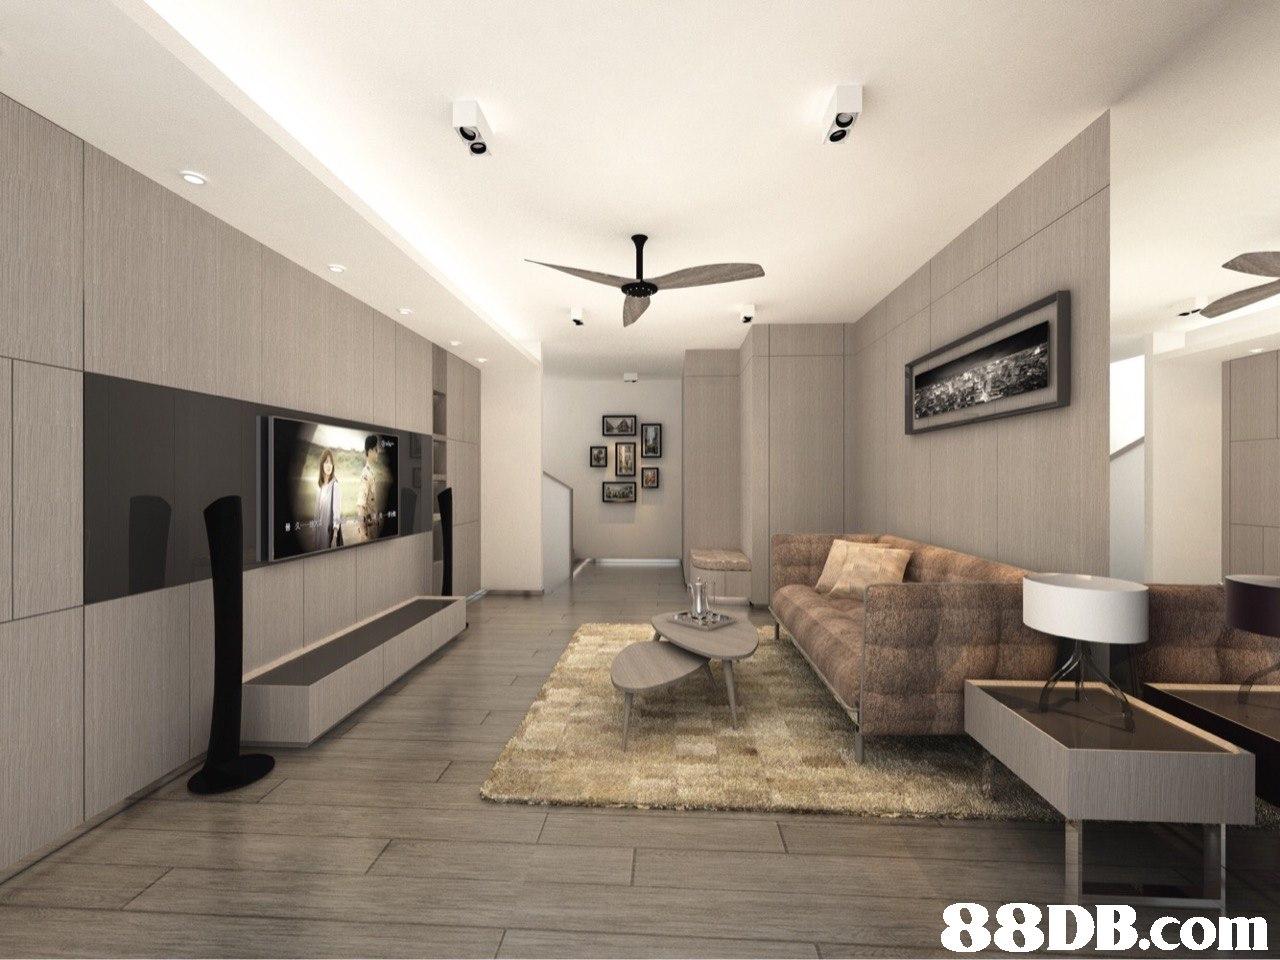 Interior design,Ceiling,Room,Property,Floor